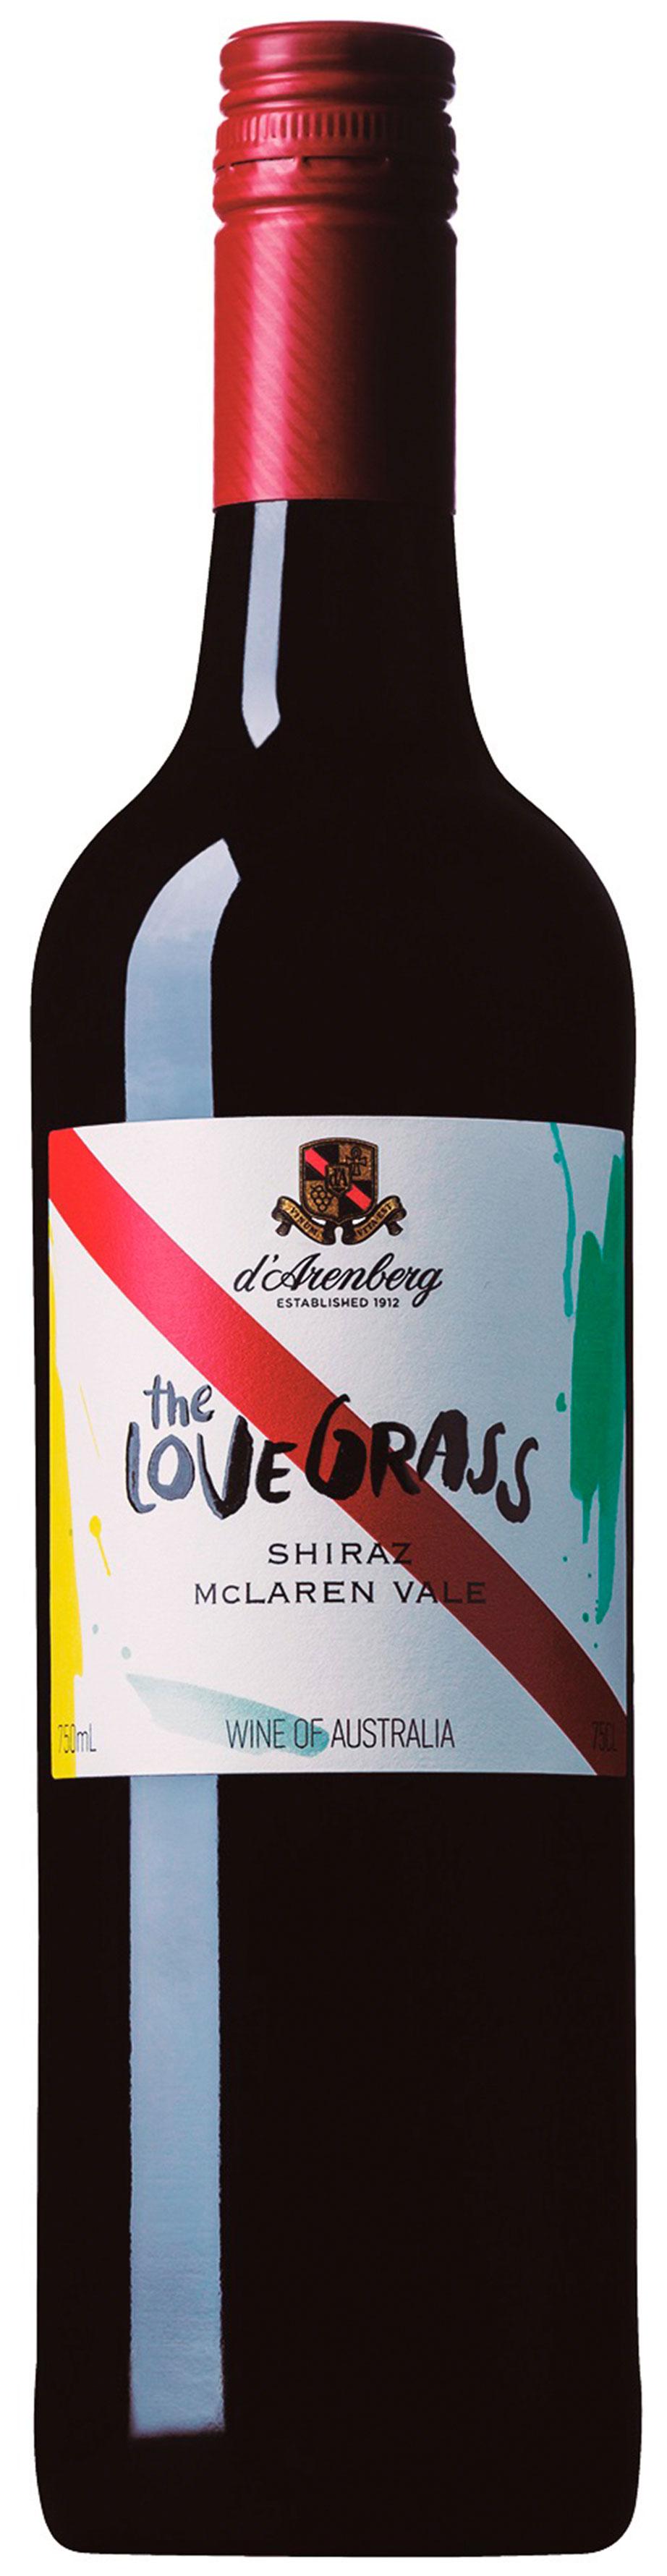 https://vinocorpperu.com/images/vinos/darenberg/the_love_grass_shiraz_2017.jpg